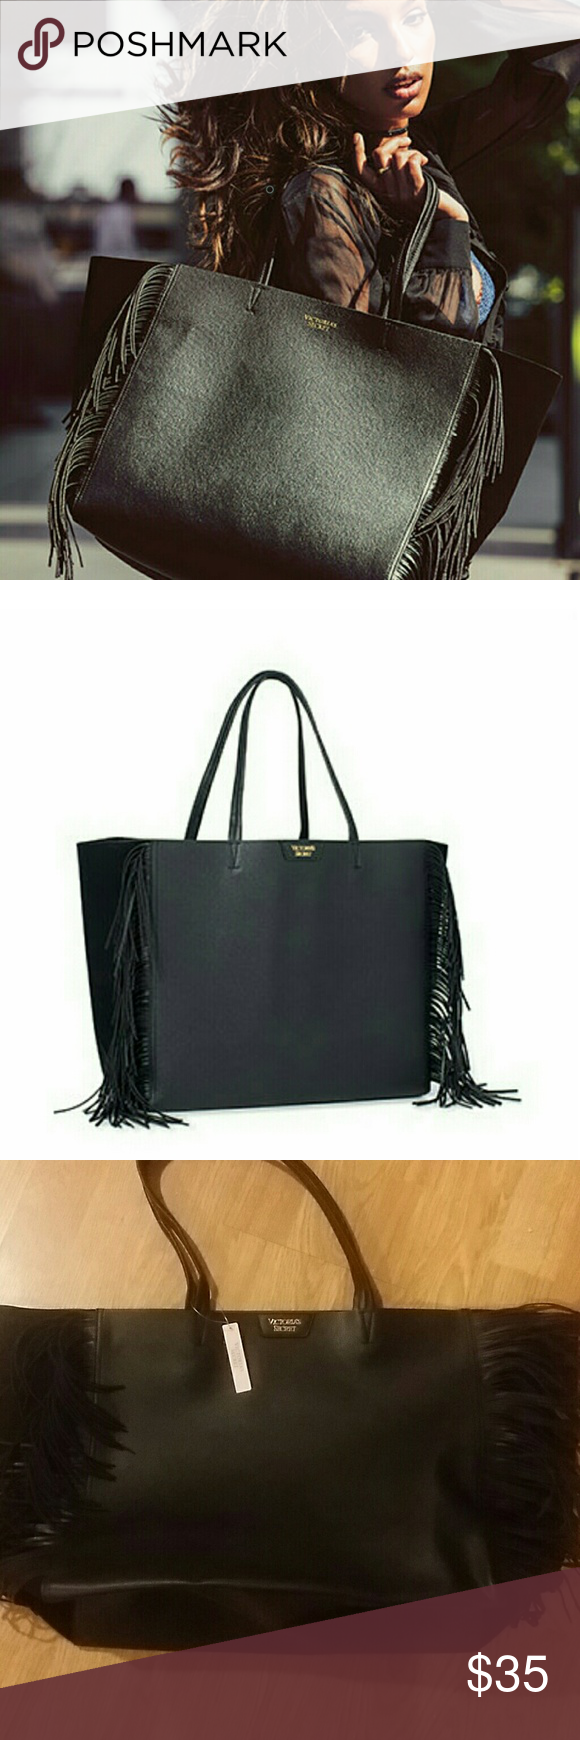 💕NWT Victoria's Secret Fringe Tote 💕  ✅✅✅✅ Black tote bag Victoria's Secret Bags Totes